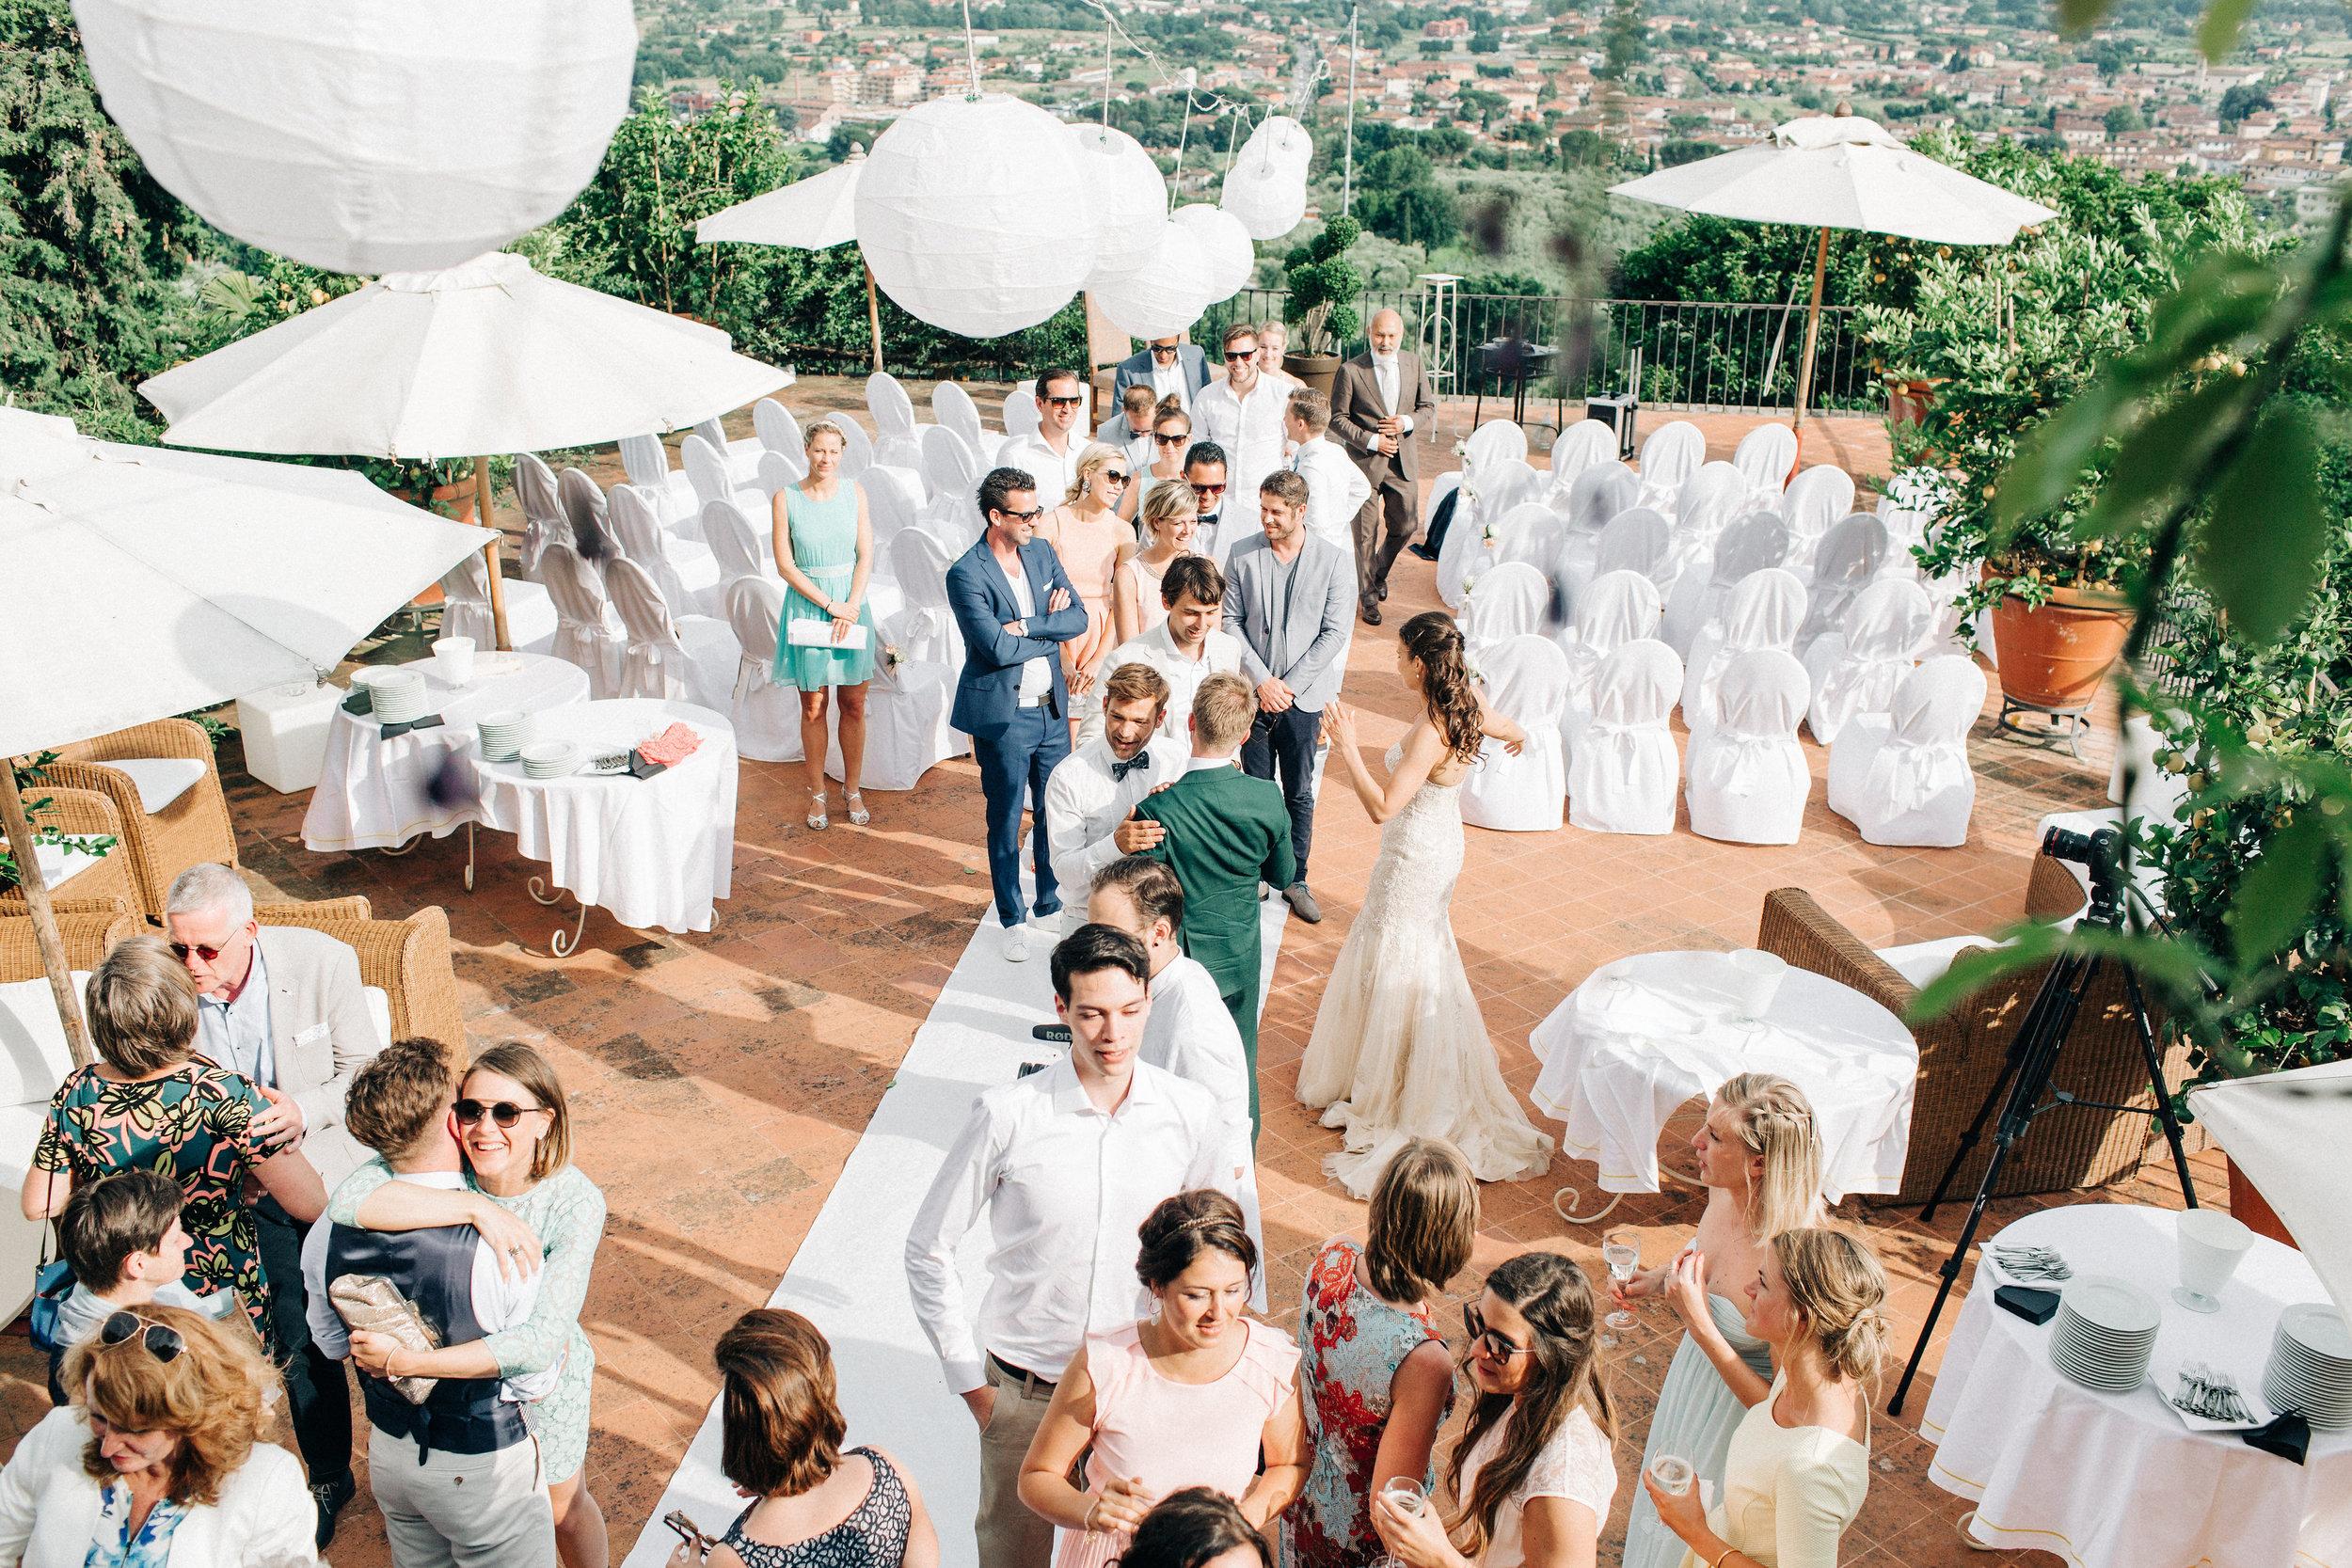 Amanda-Drost-Photography-wedding-Arjan+Emmy-259.jpg